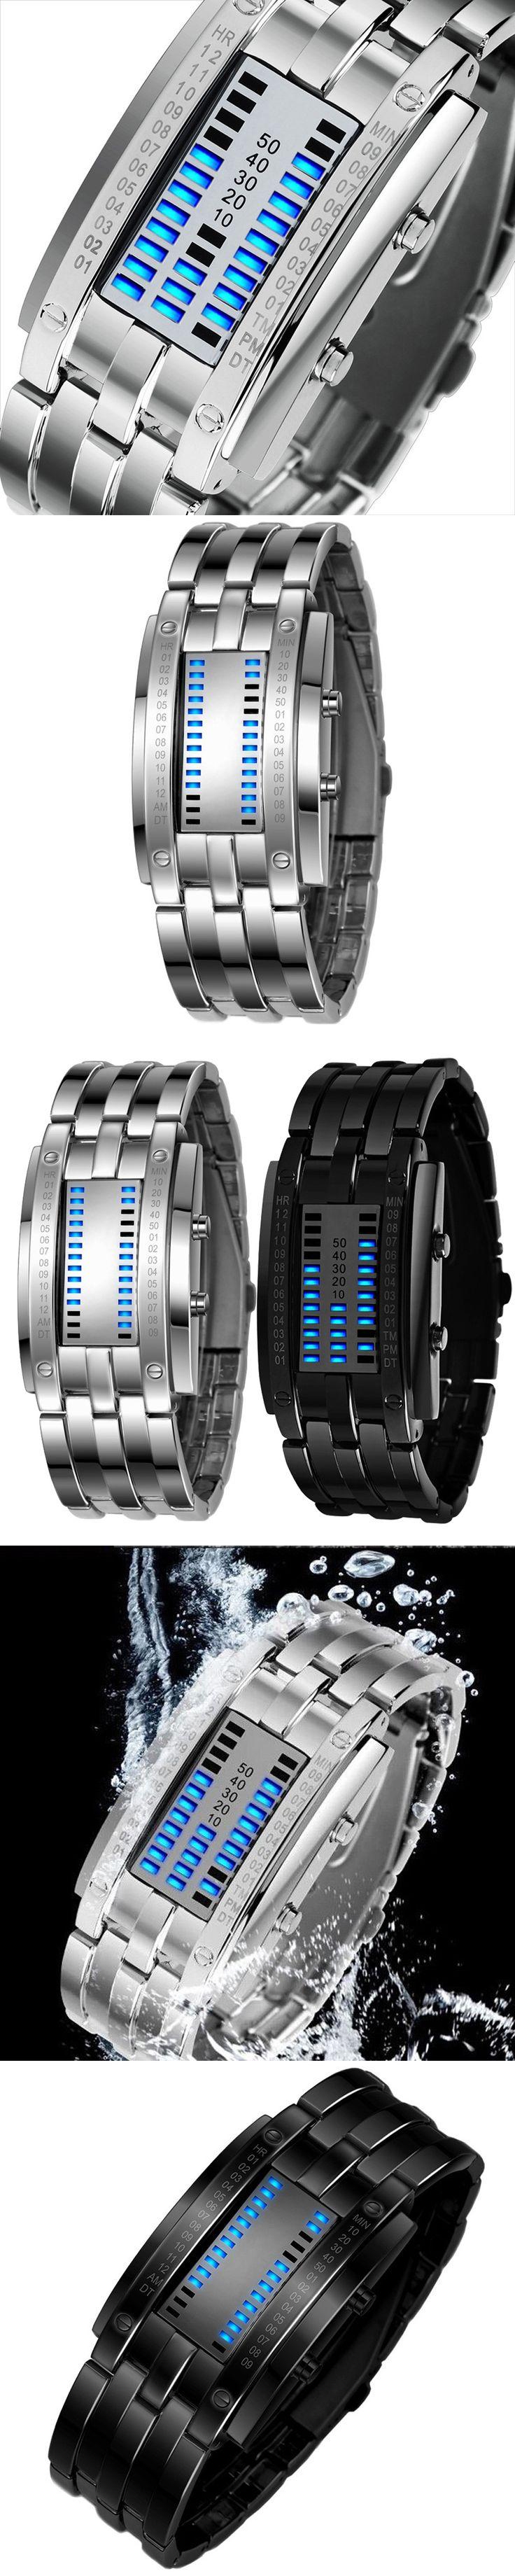 Multi function Men's Watch Luxury Stainless Steel Band LED Digital Watch Date Bracelet Sport Watches reloj hombre